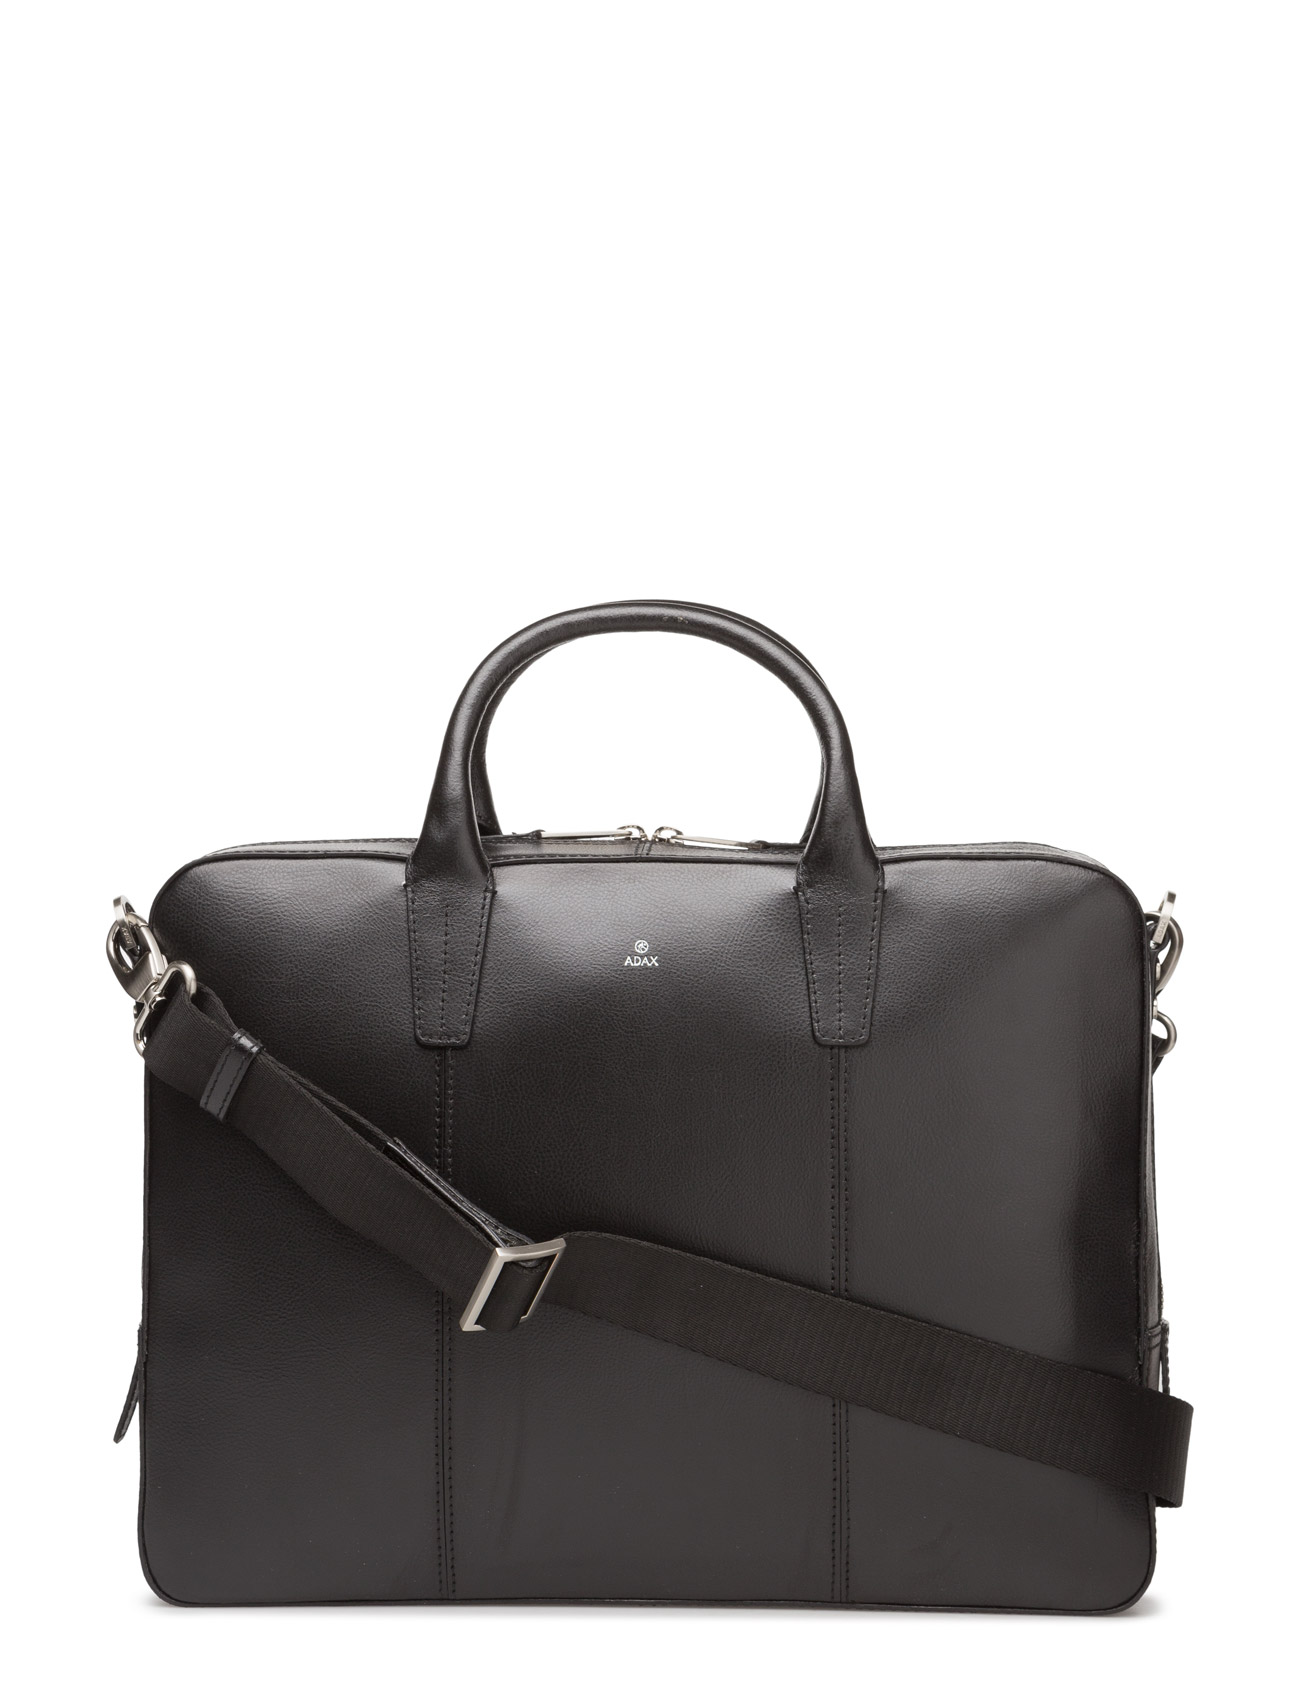 Denver briefcase magne fra adax fra boozt.com dk